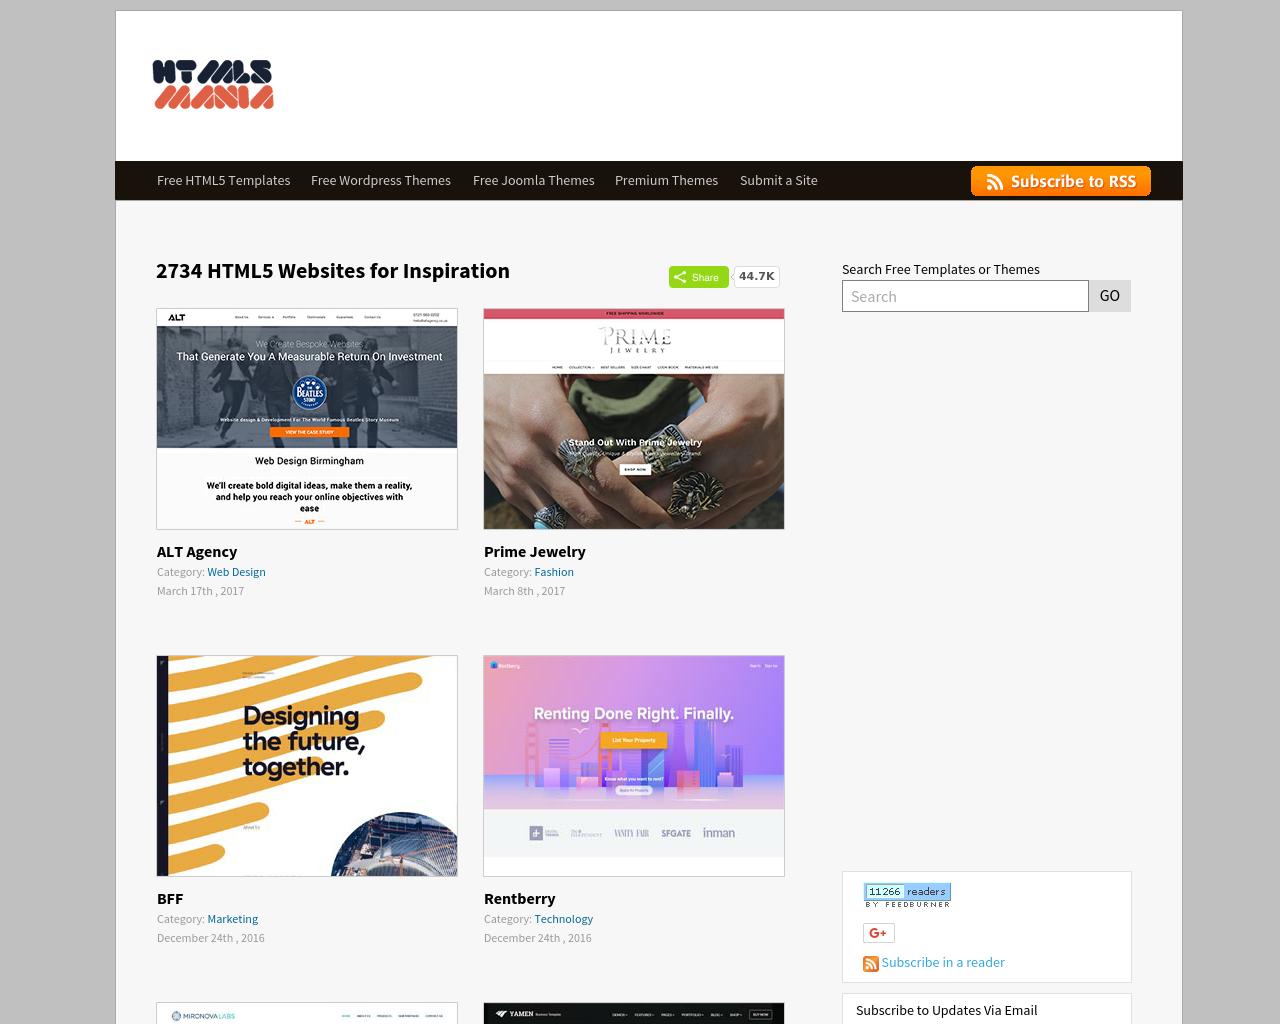 HTML5-MANIA-Advertising-Reviews-Pricing